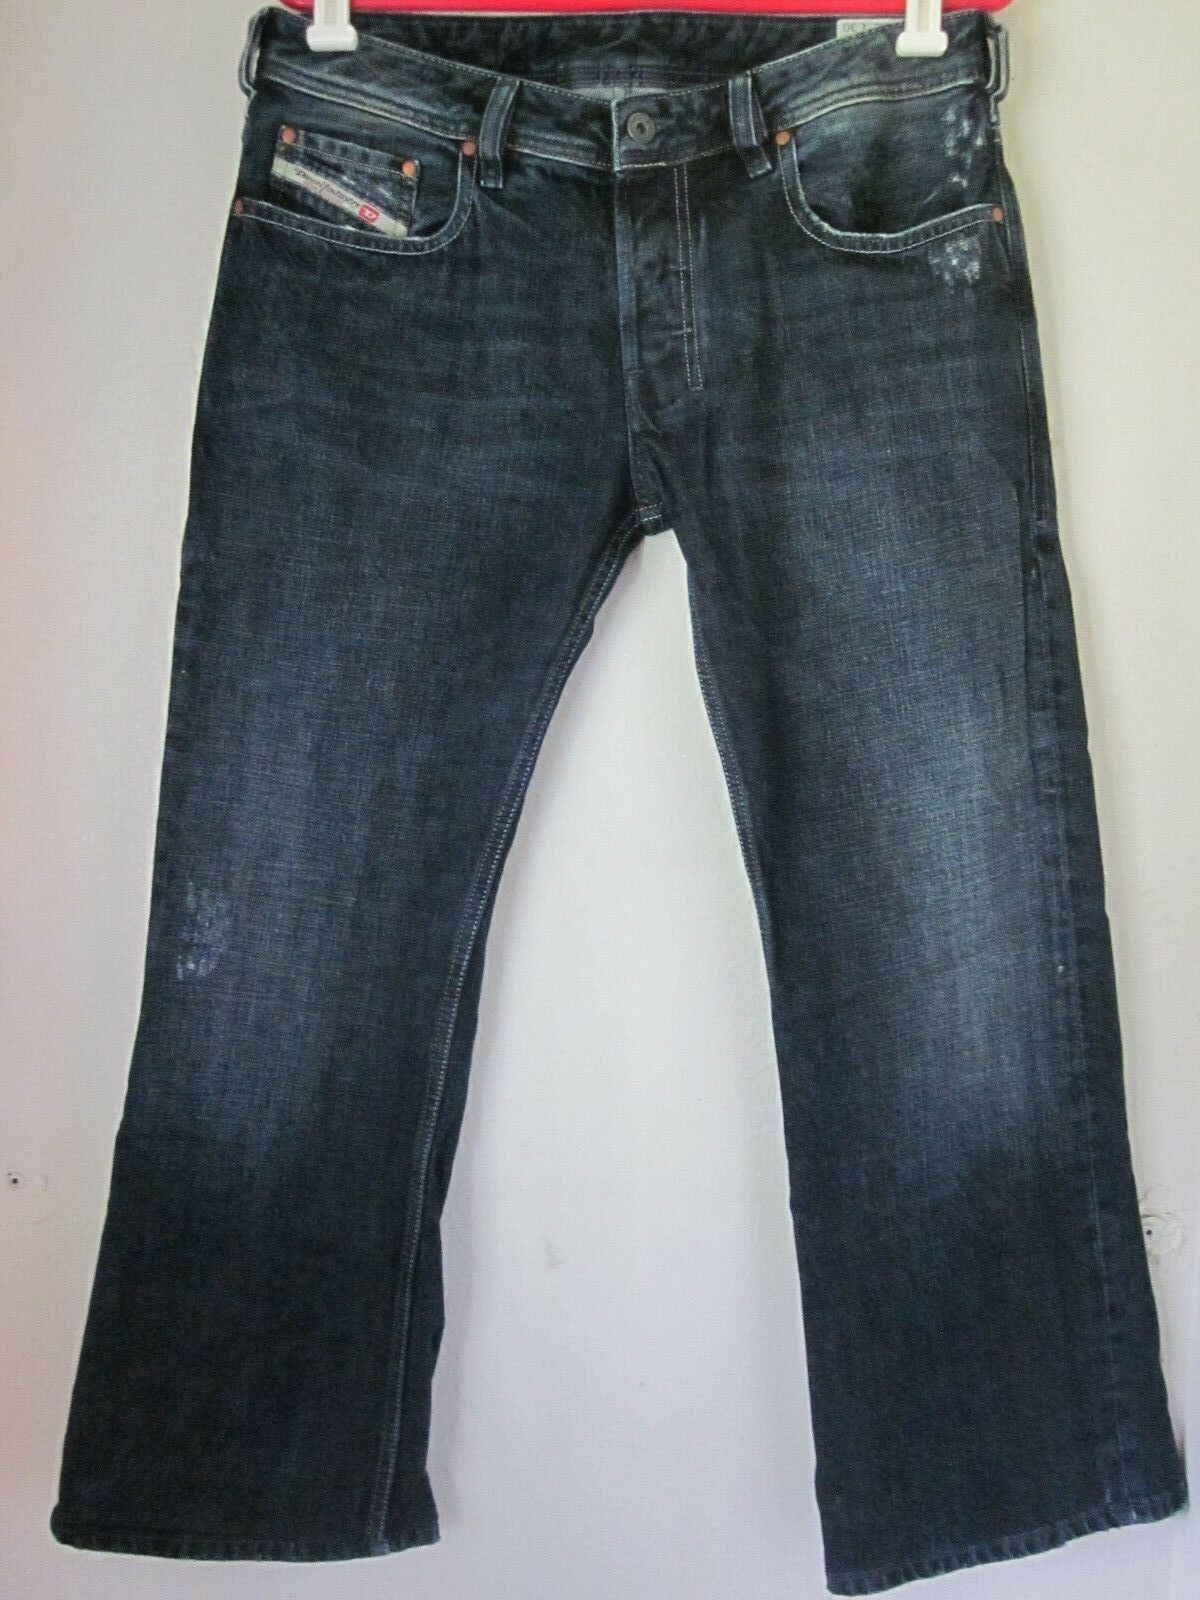 Men's Diesel Zathan Jeans 32x28 WASH 0071s button fly bootcut